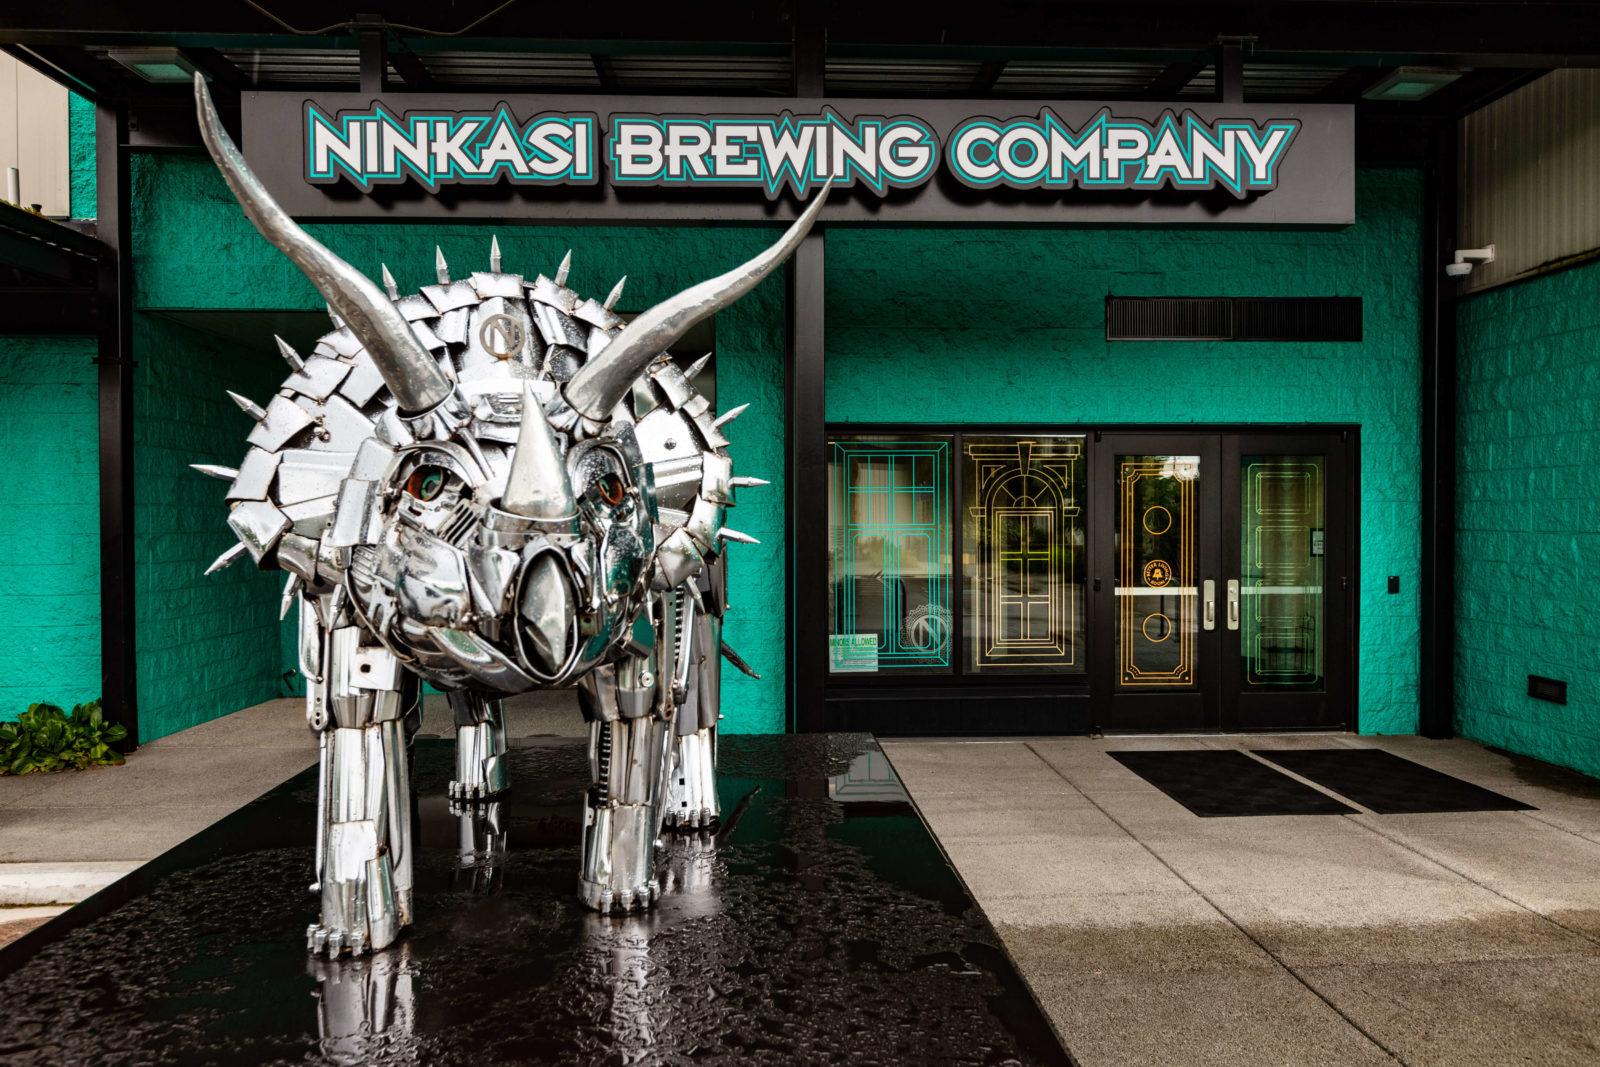 Ninkasi Better Living Room triceratops sculpture entrance